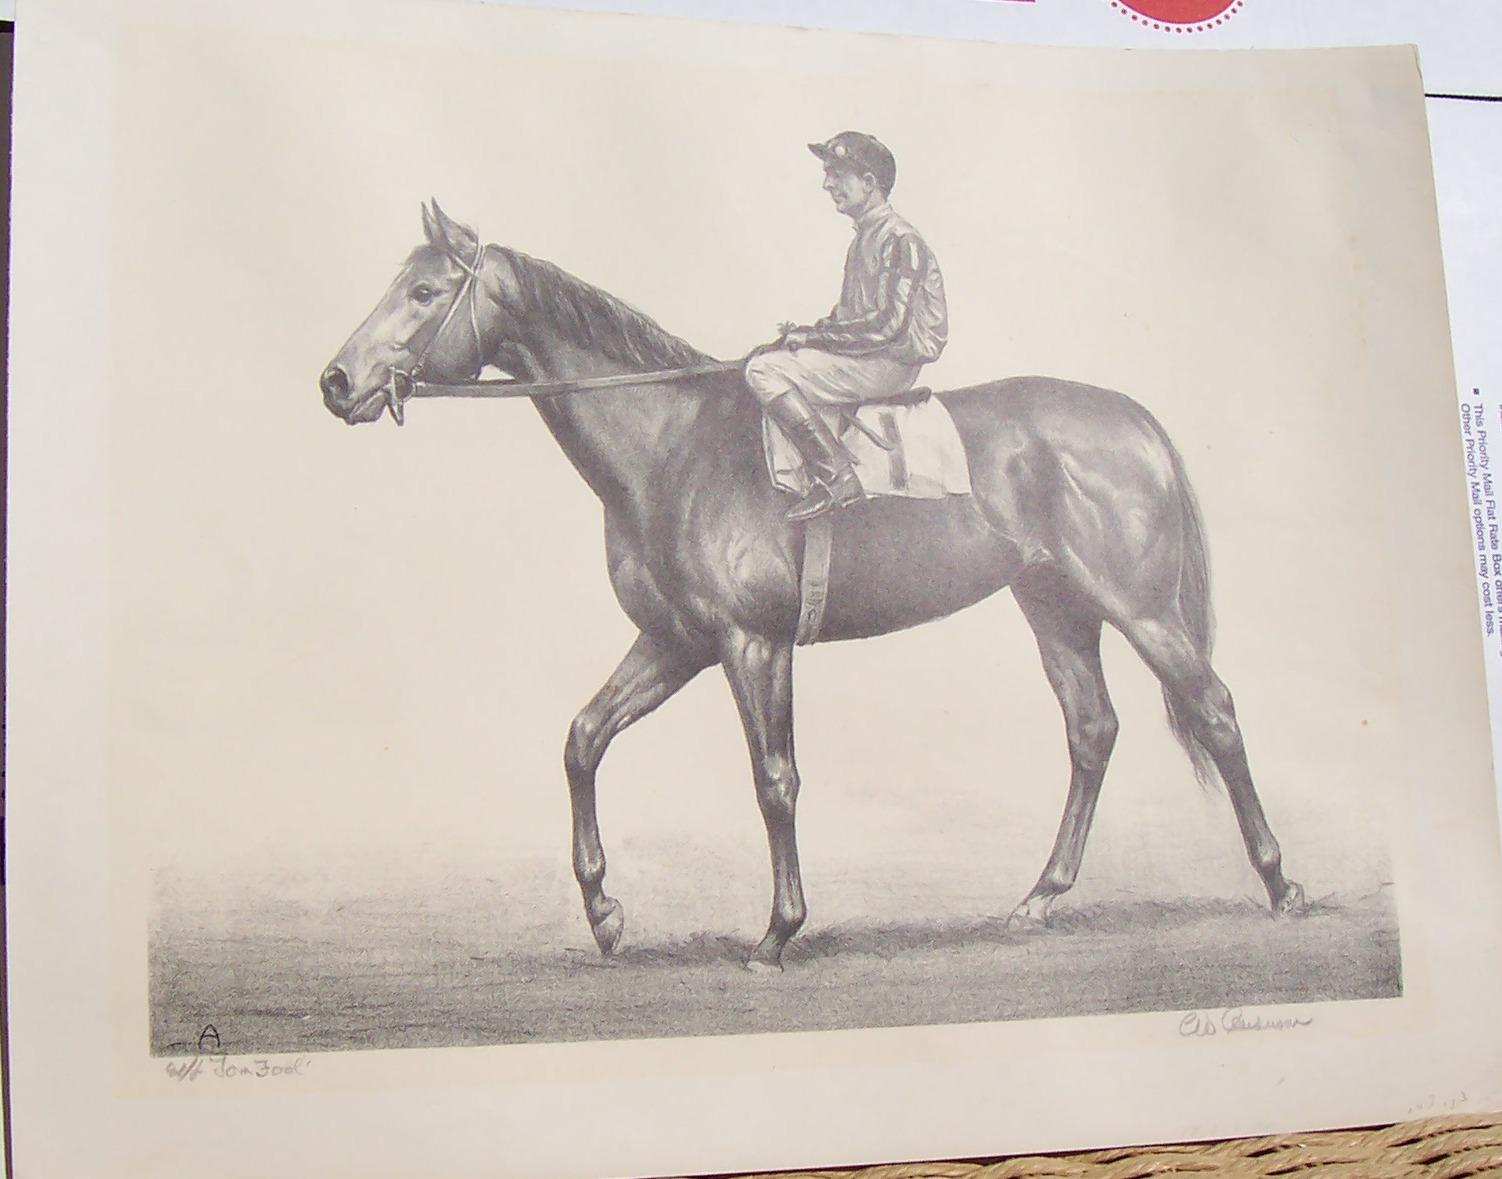 Good Wallpaper Horse Flicka - cw_anderson_lithos_w_signatures_026  Image_1285.jpg